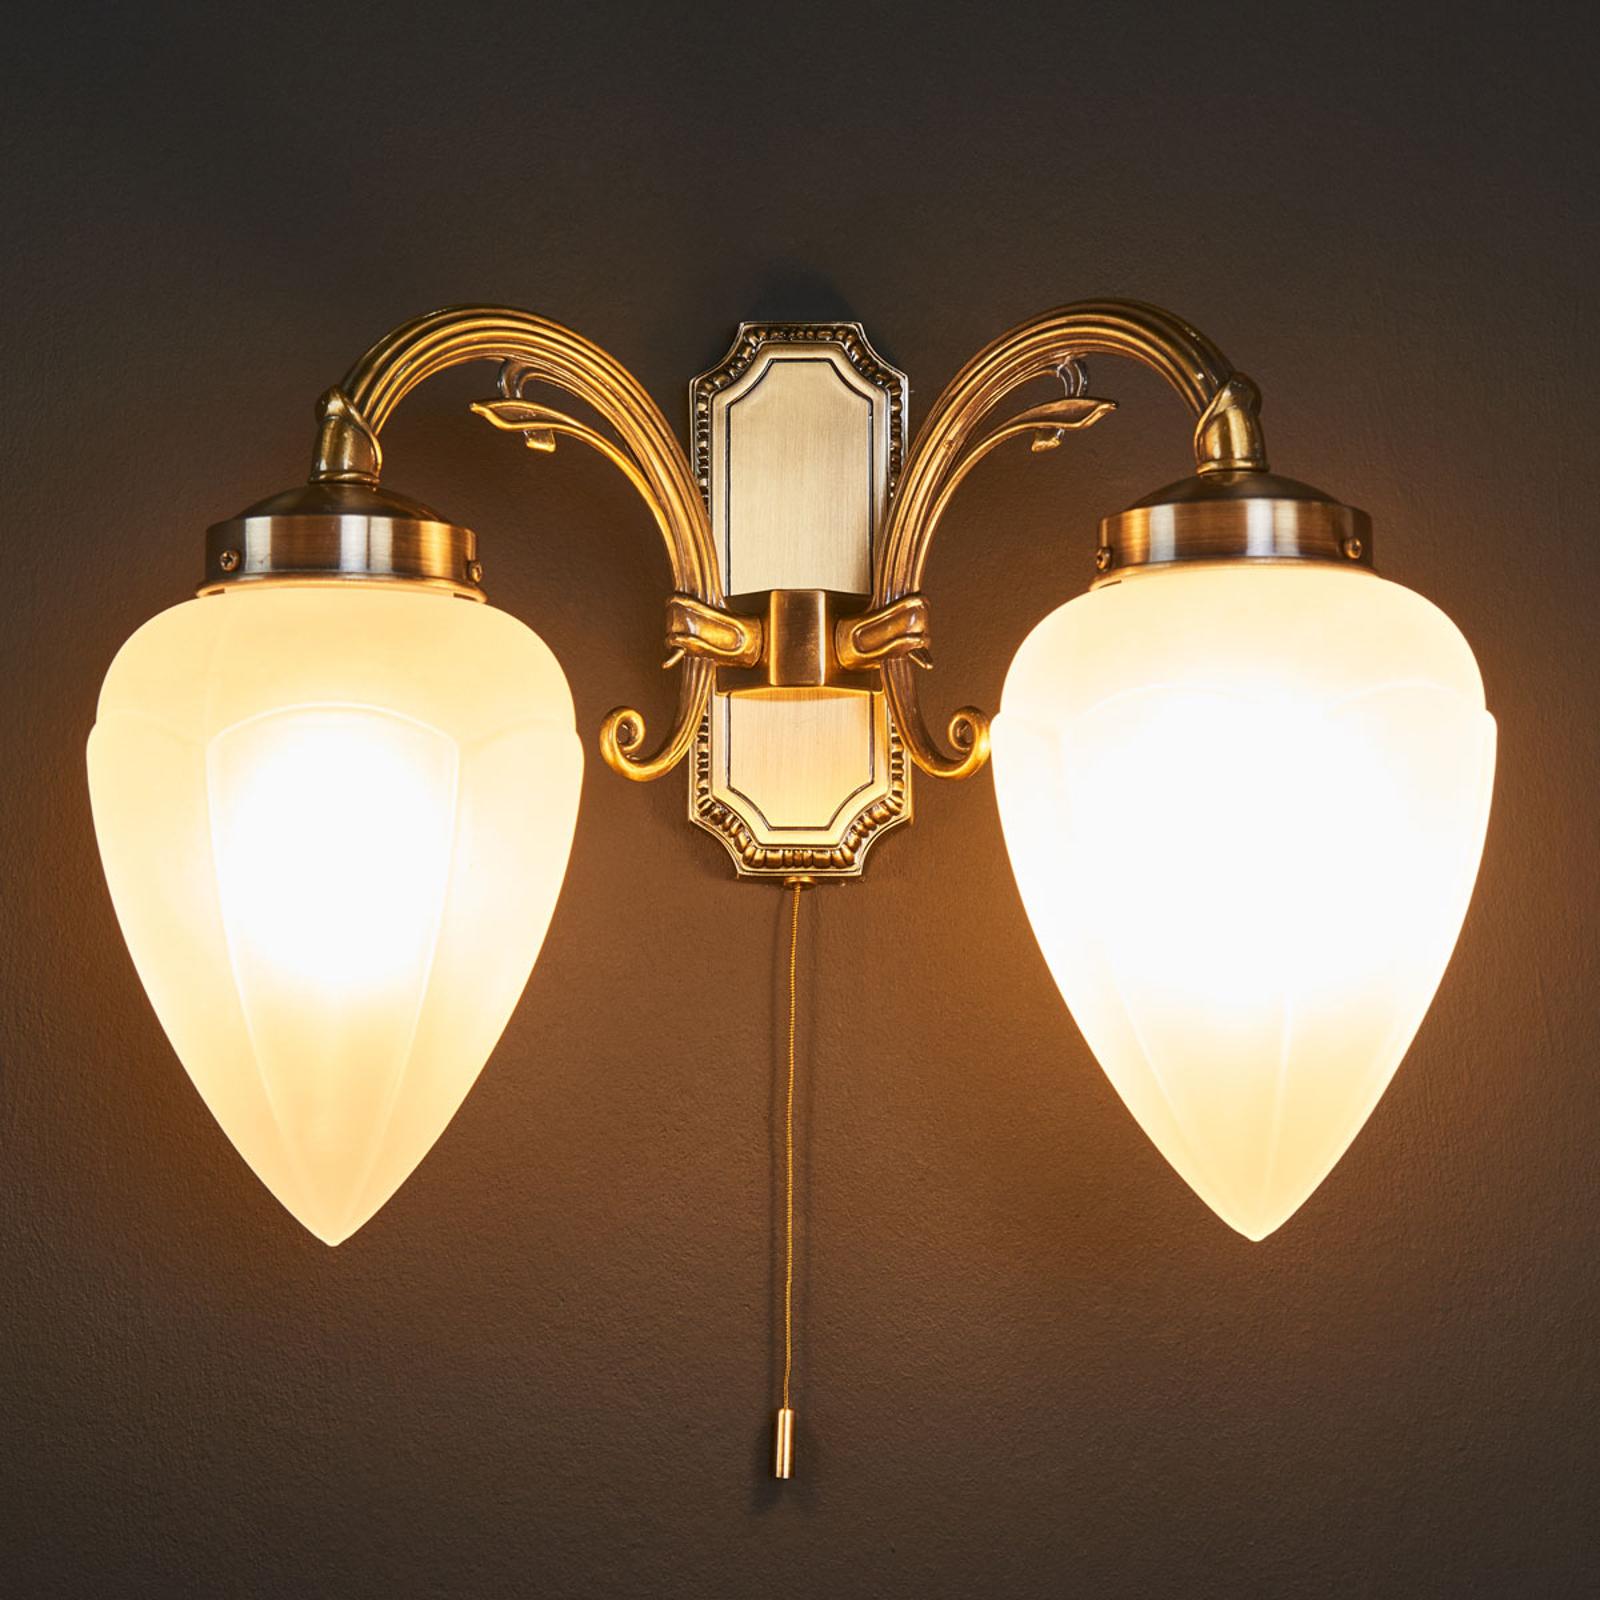 Wandlamp Impery, 2-lamps